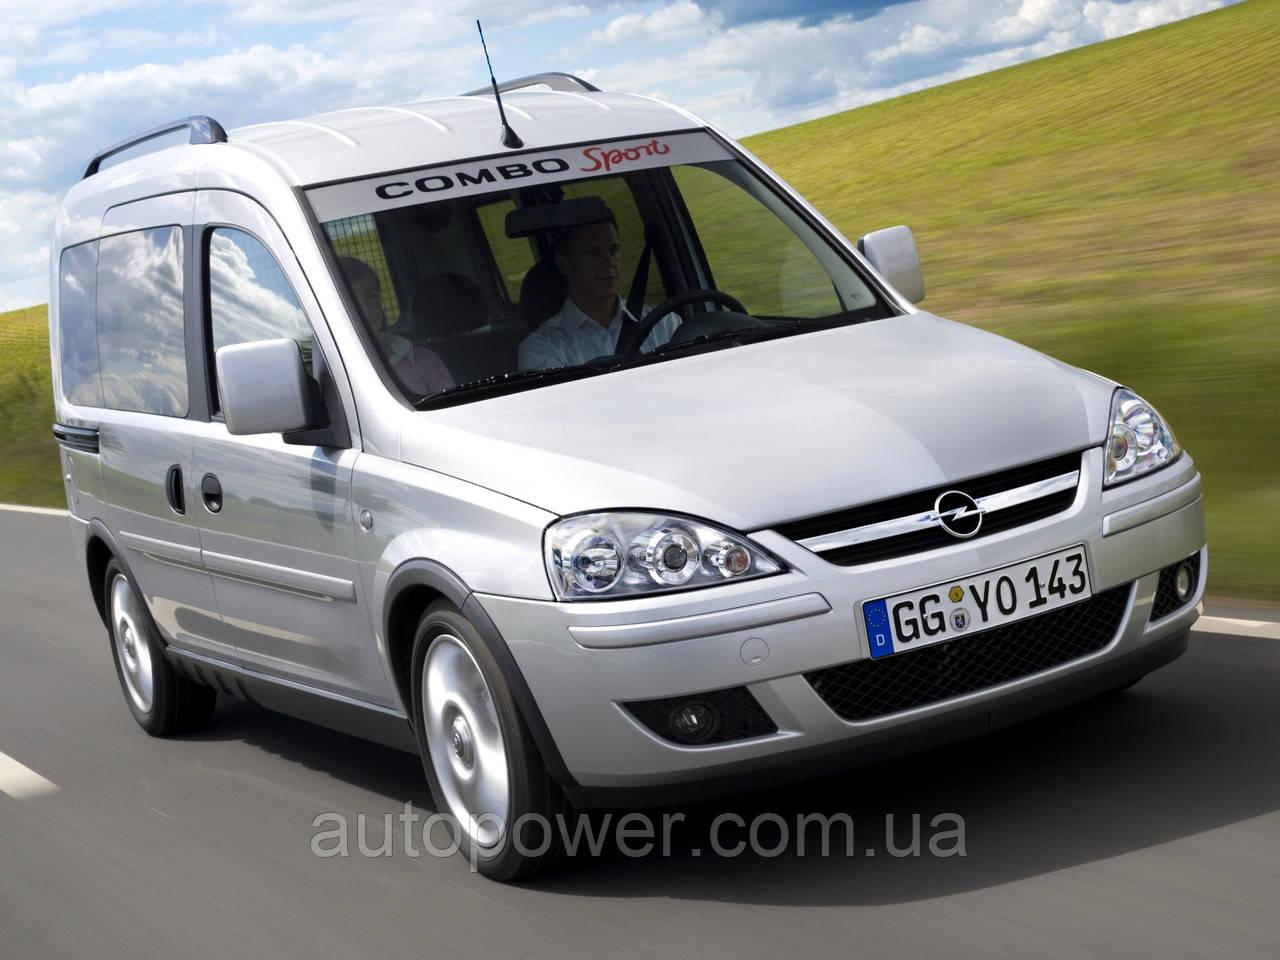 Фаркоп на Opel Combo универсал 09/2001-2012